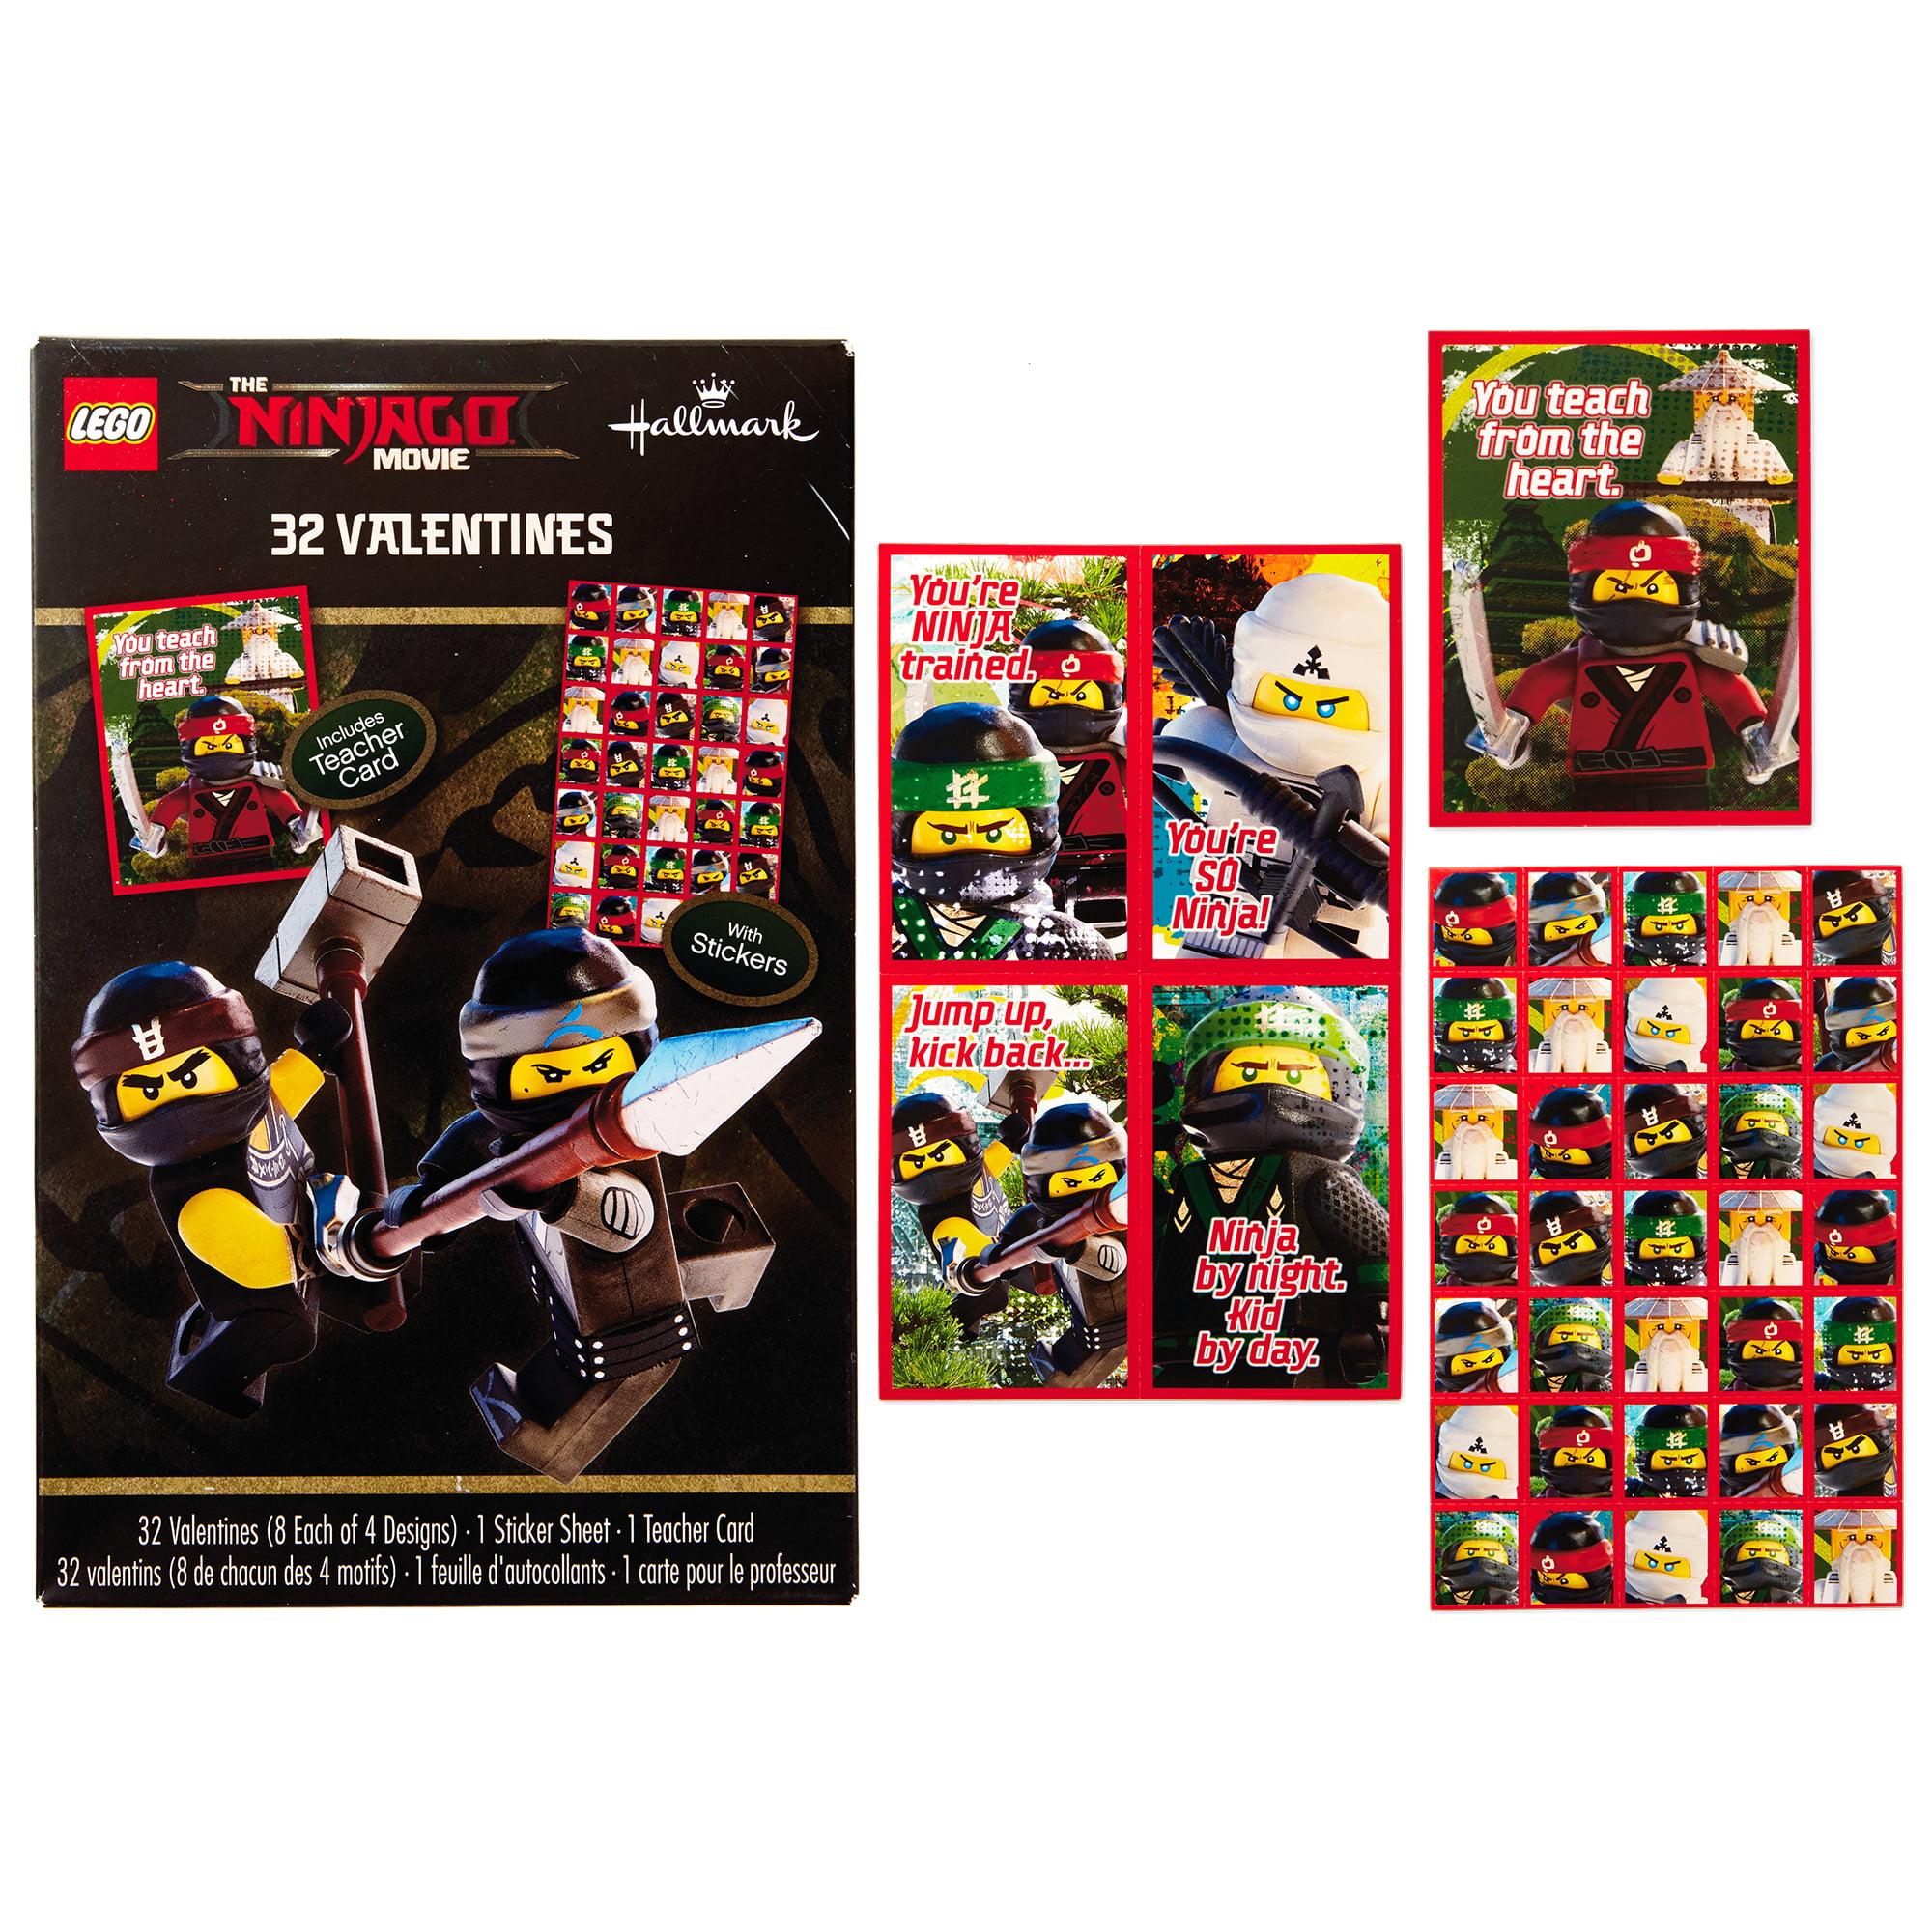 Hallmark Kids Ninjago Valentine's Day Cards (32 Cards, 35 Stickers, 1 Teacher Card)